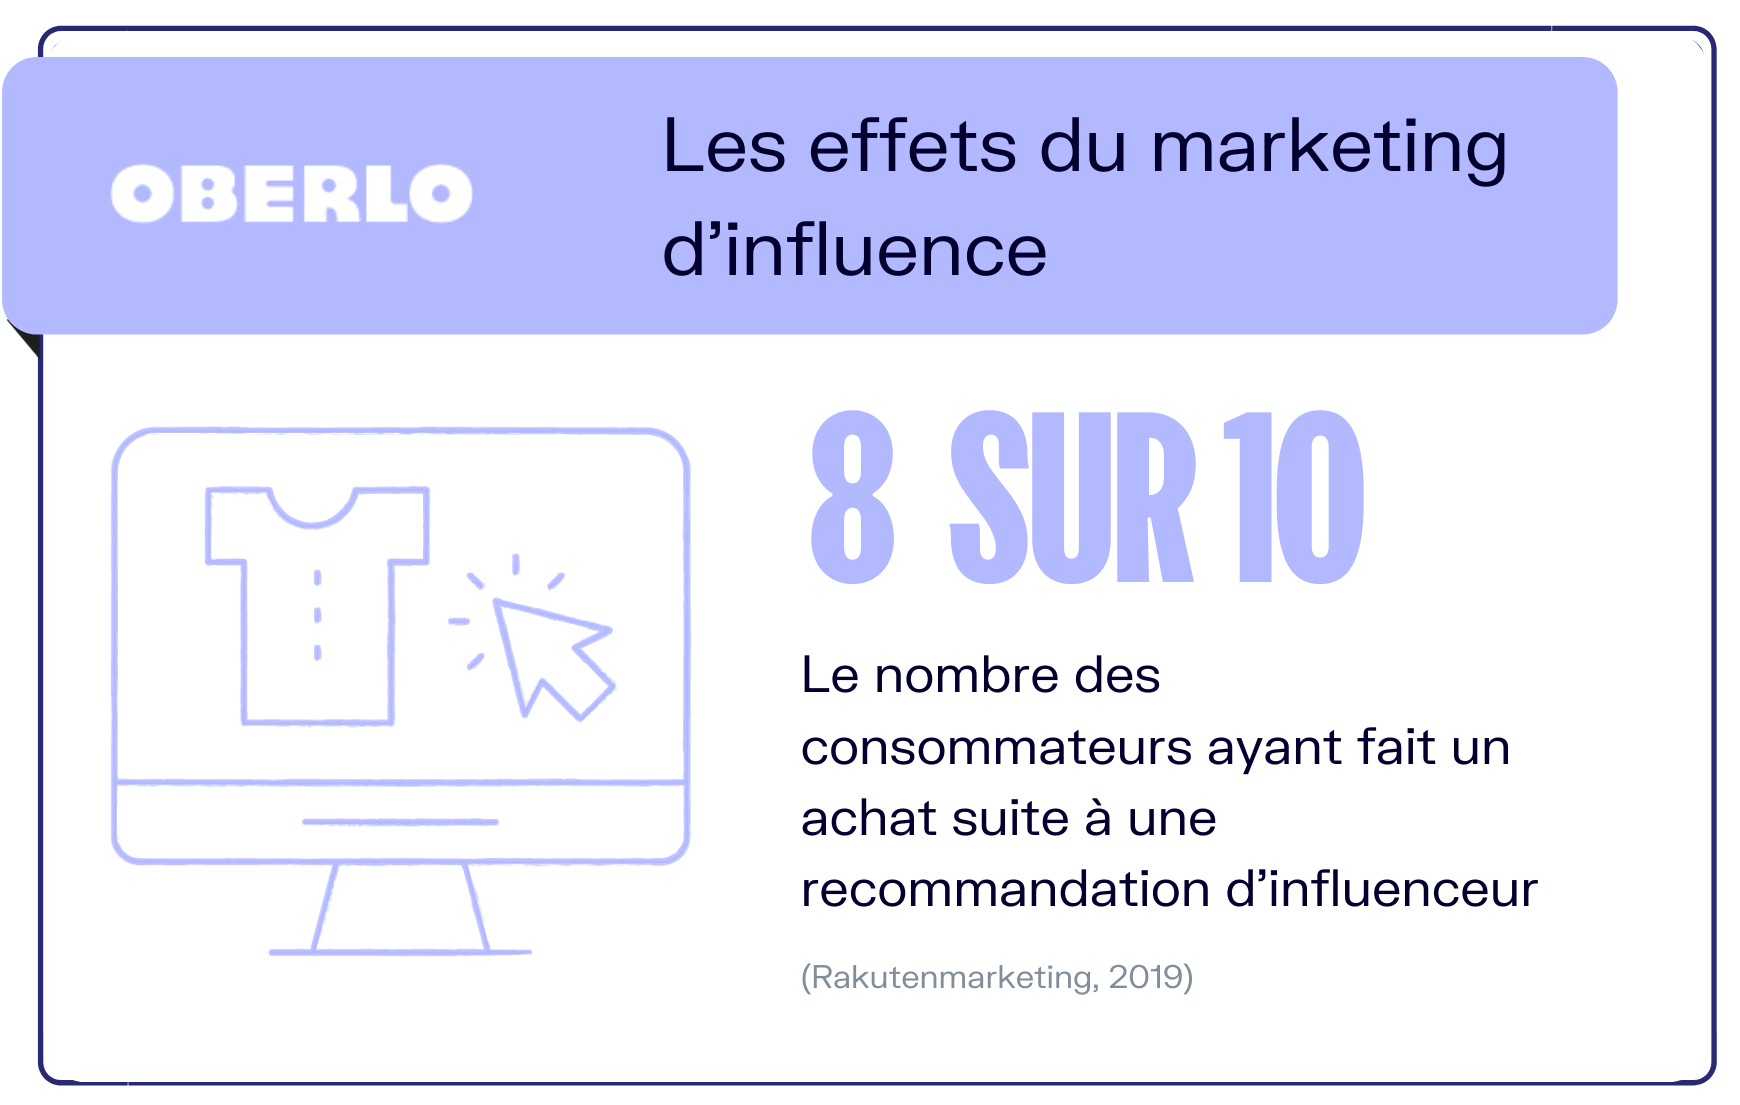 Effets marketing influence